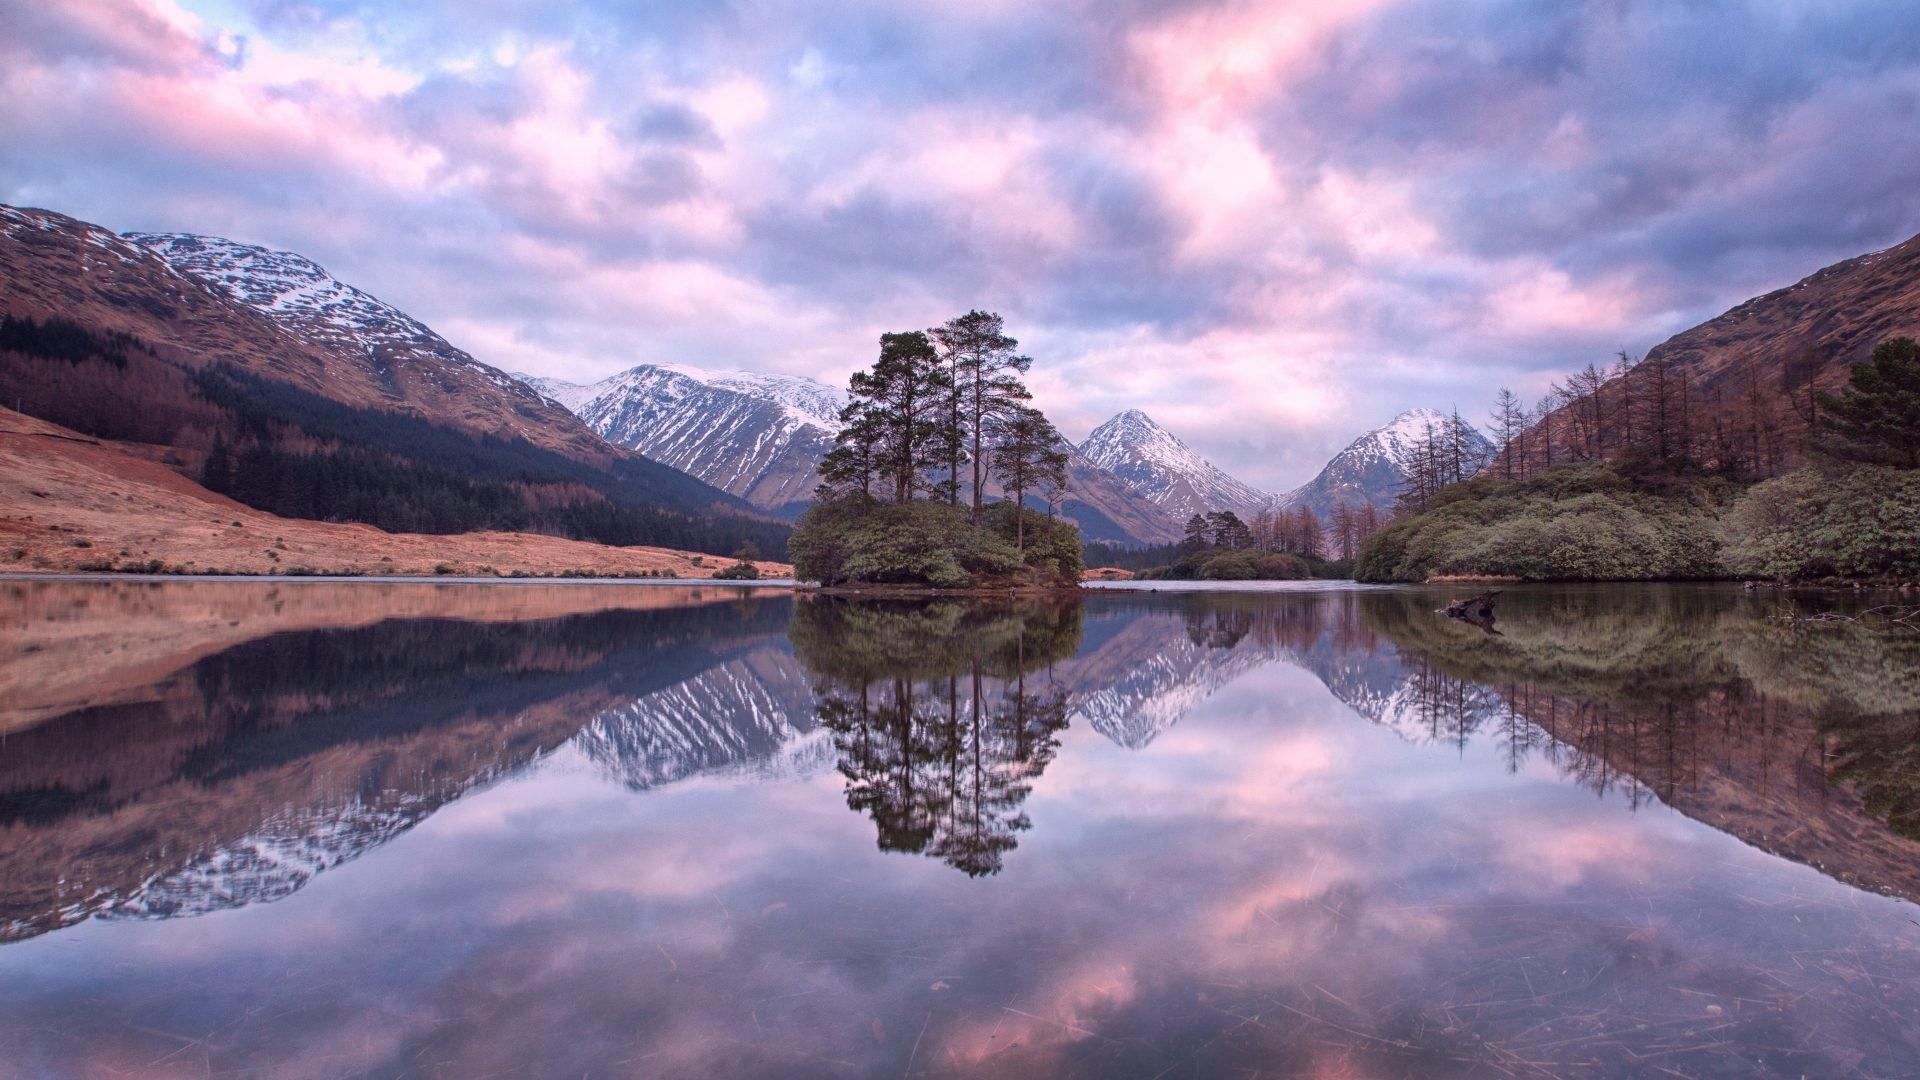 Scotland Scenery Wallpaper 41 Images